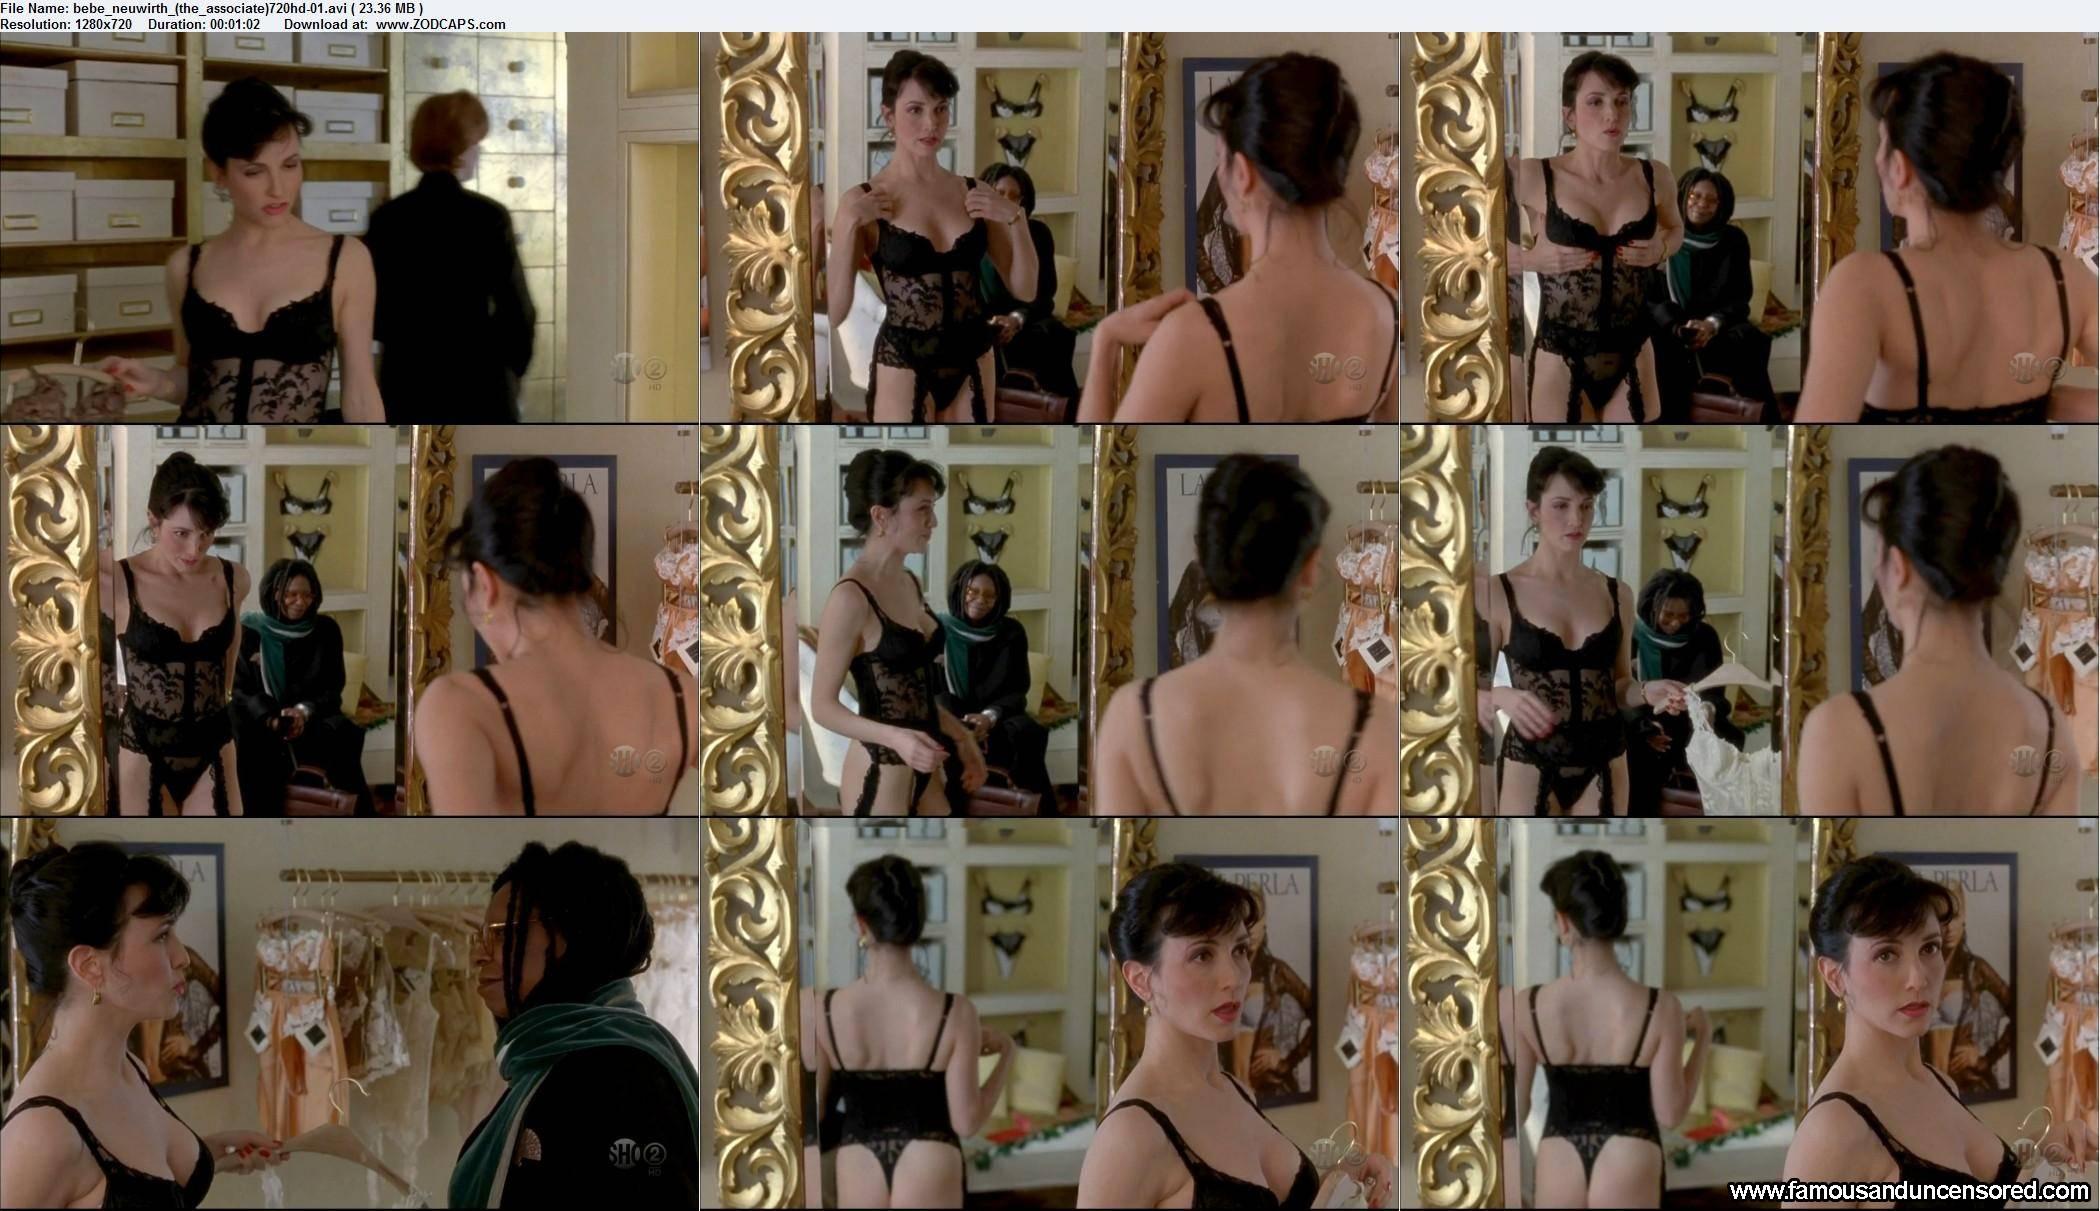 Bebe Neuwirth Nude Pics Pics, Sex Tape Ancensored